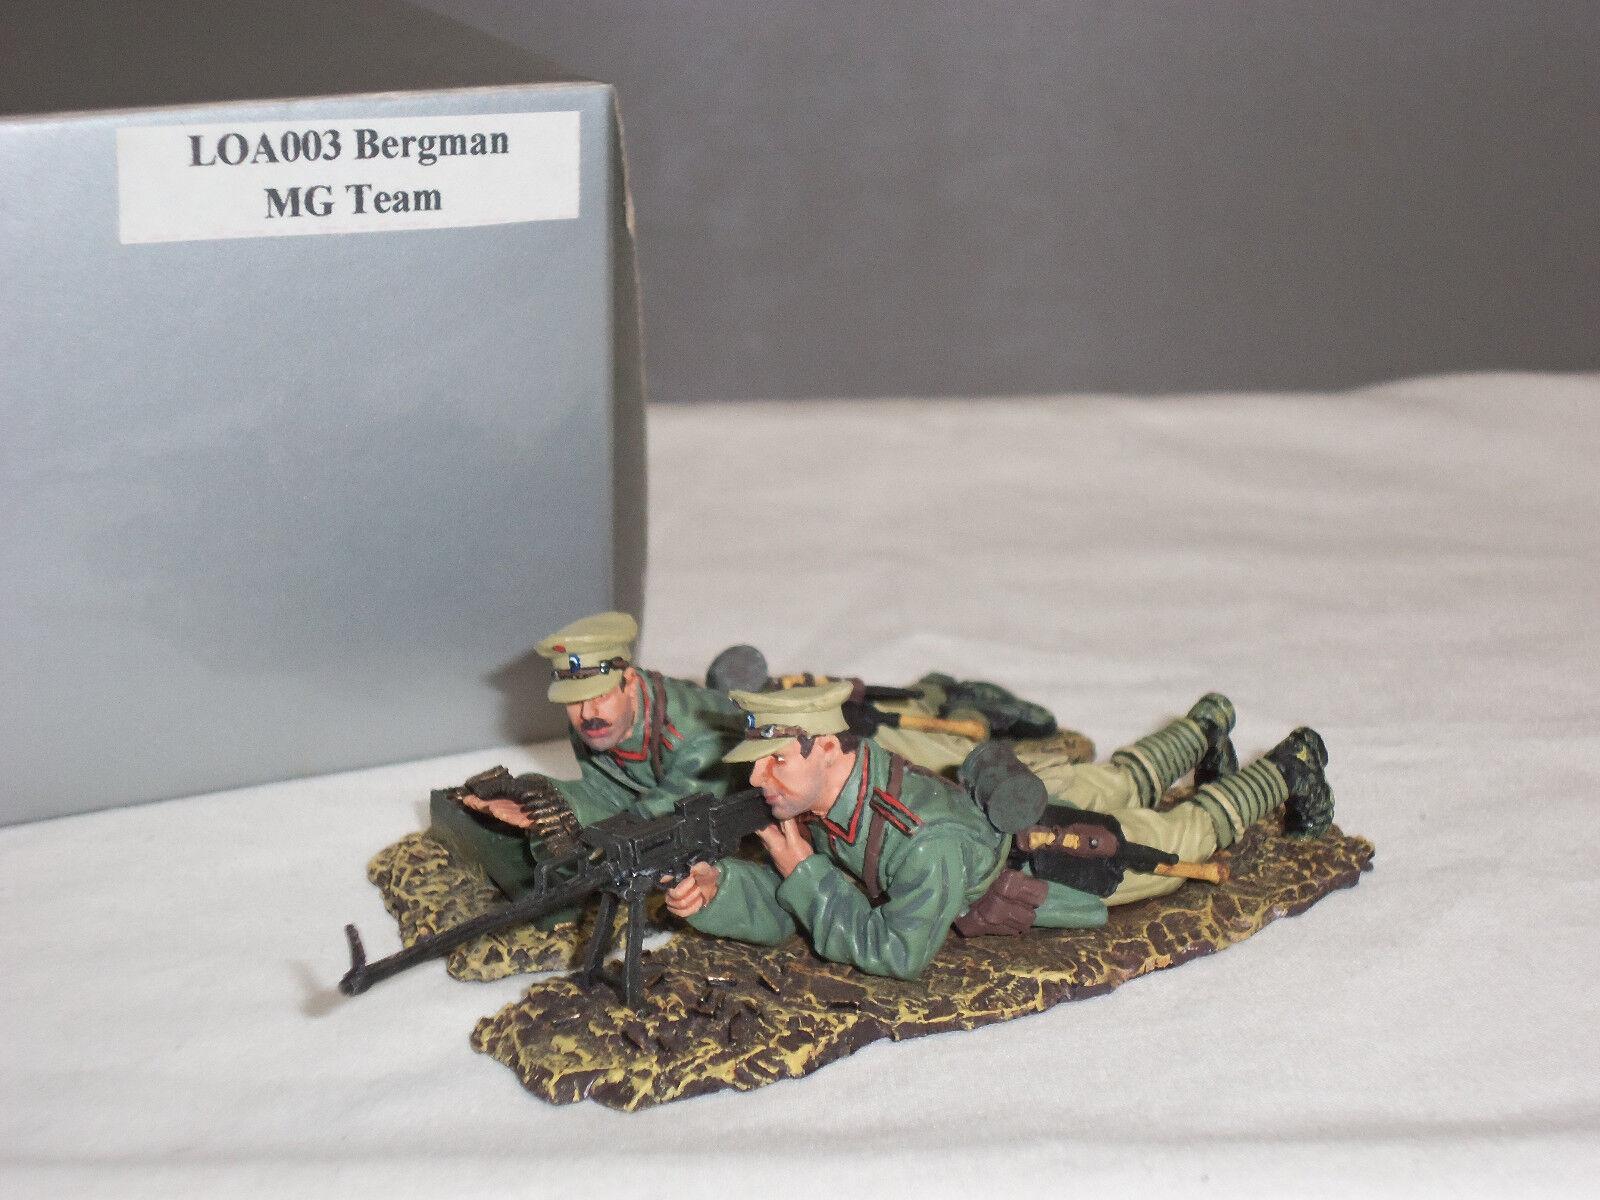 THOMAS GUNN LOA003 WW1 GERMAN BERGMAN MG15 GUN TEAM DESERT TOY SOLDIER SET